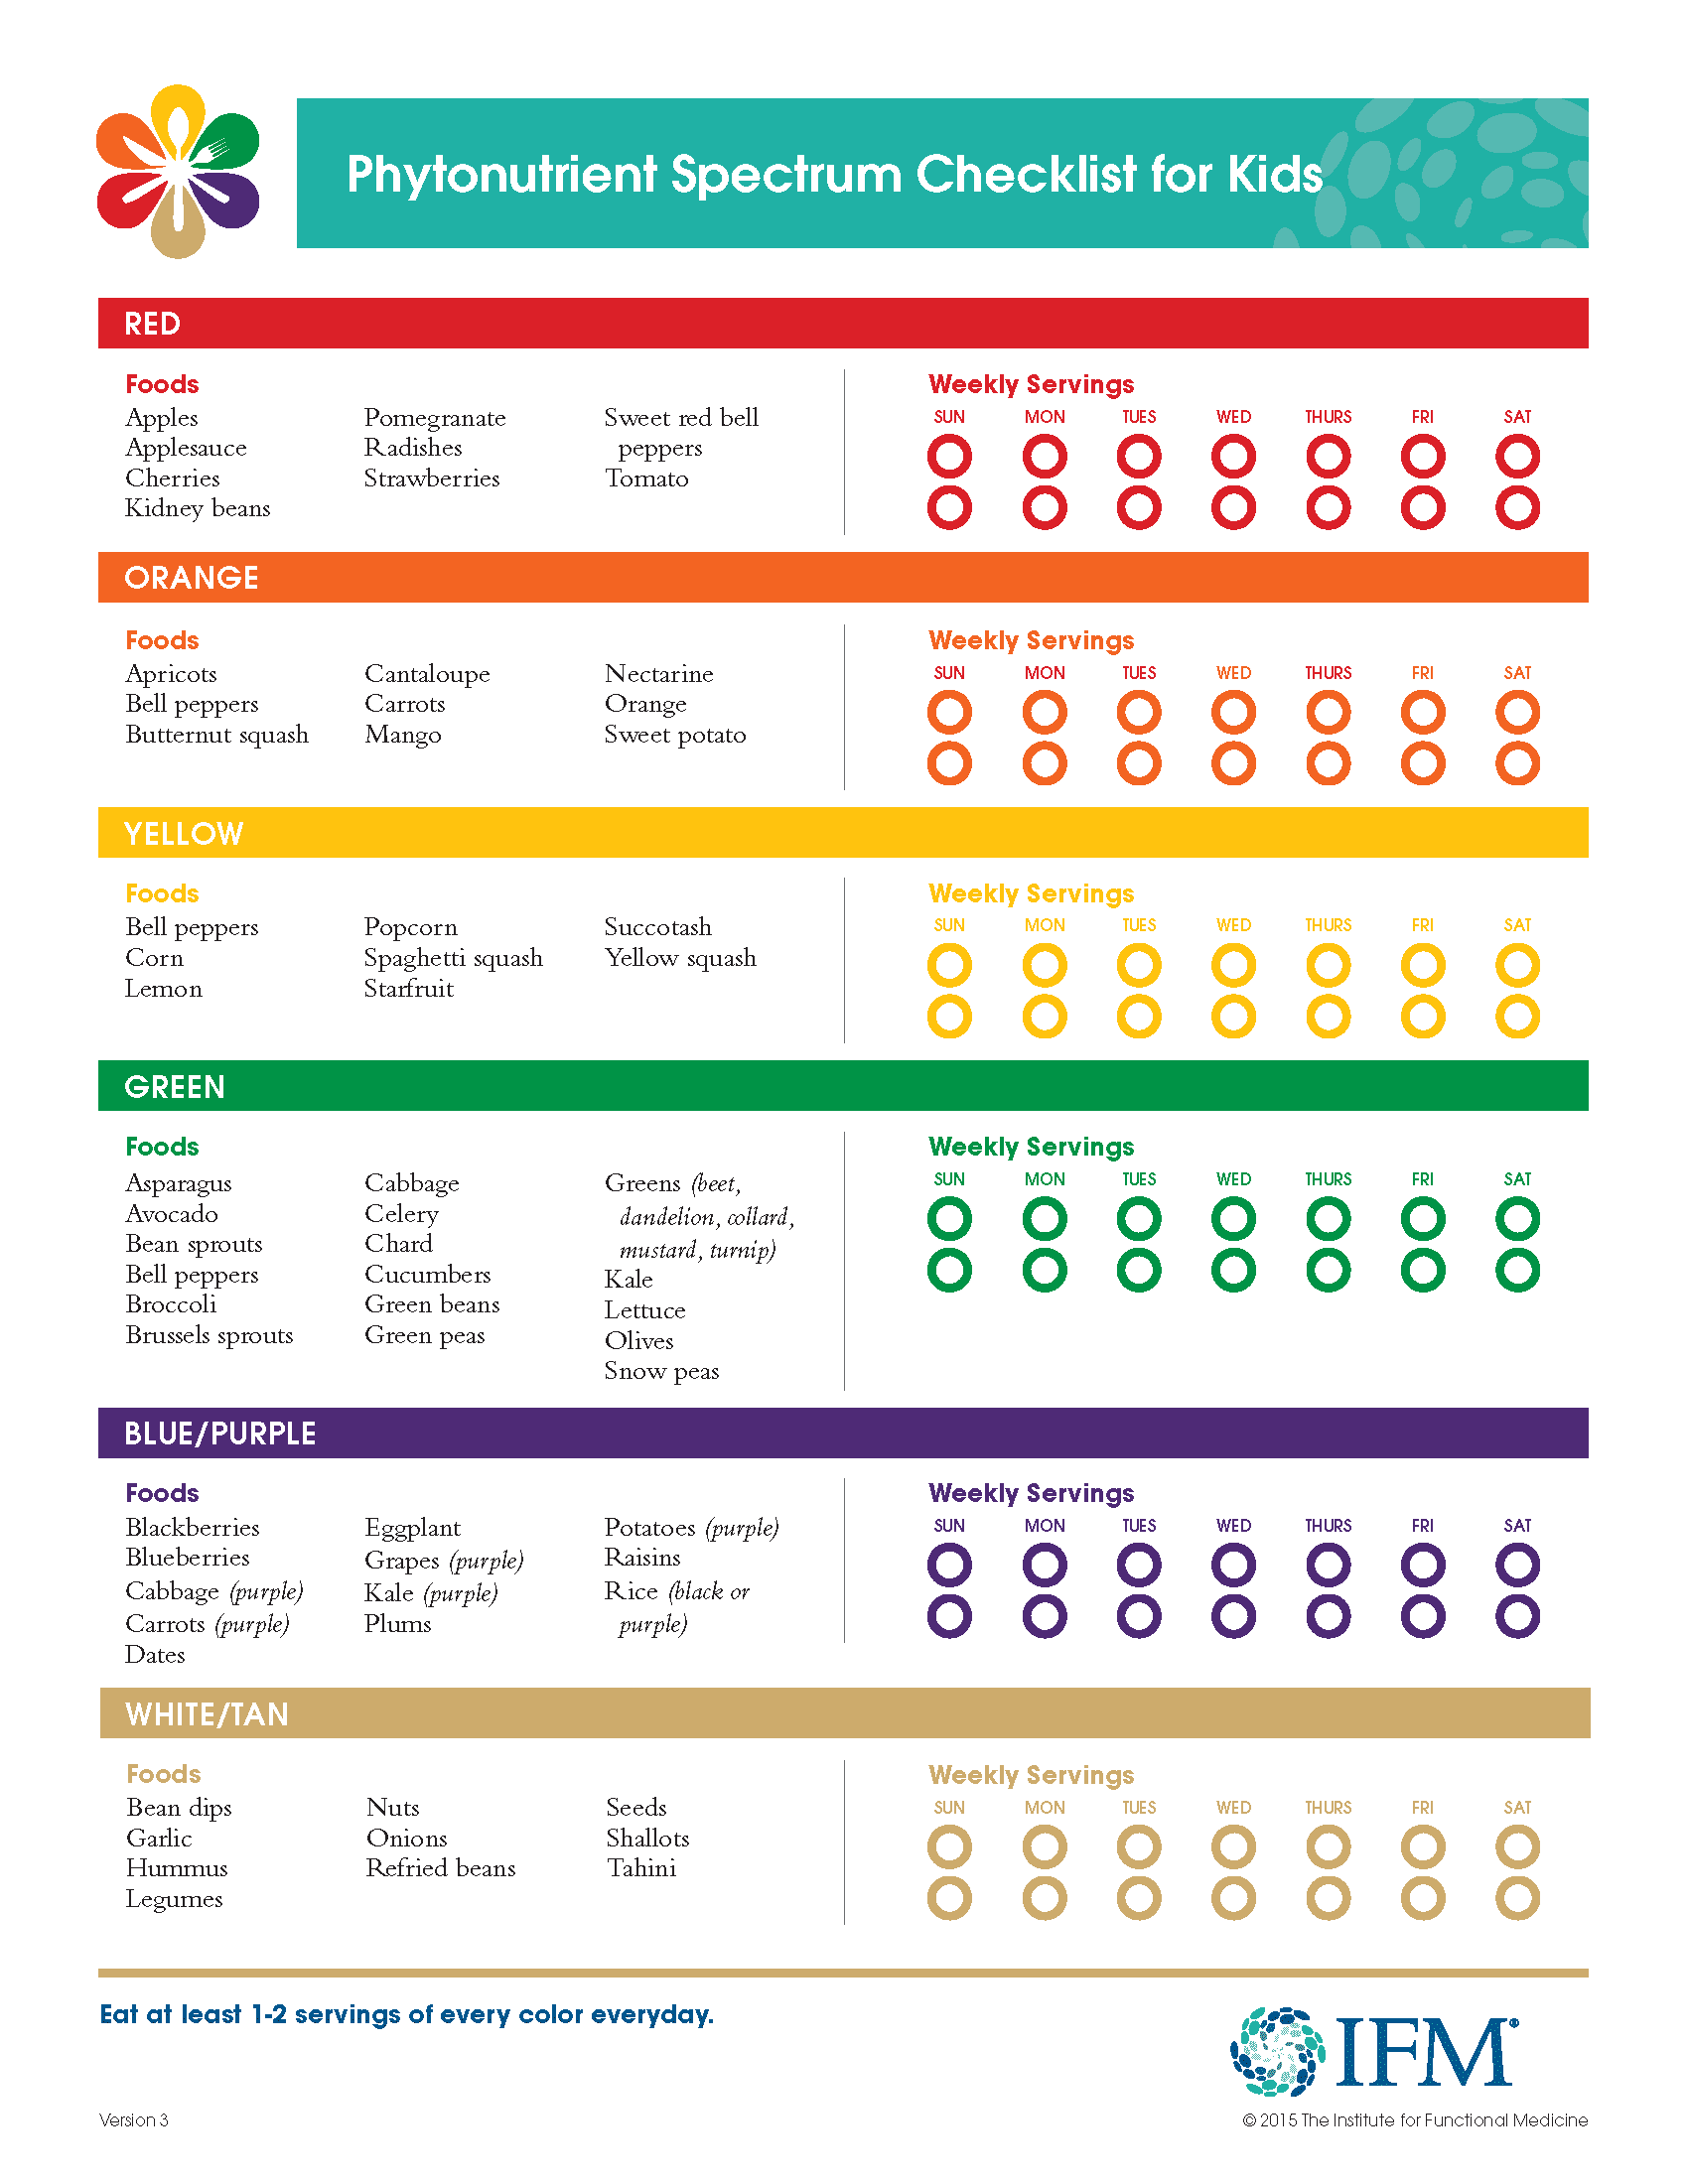 Phytonutrient Spectrum Foods